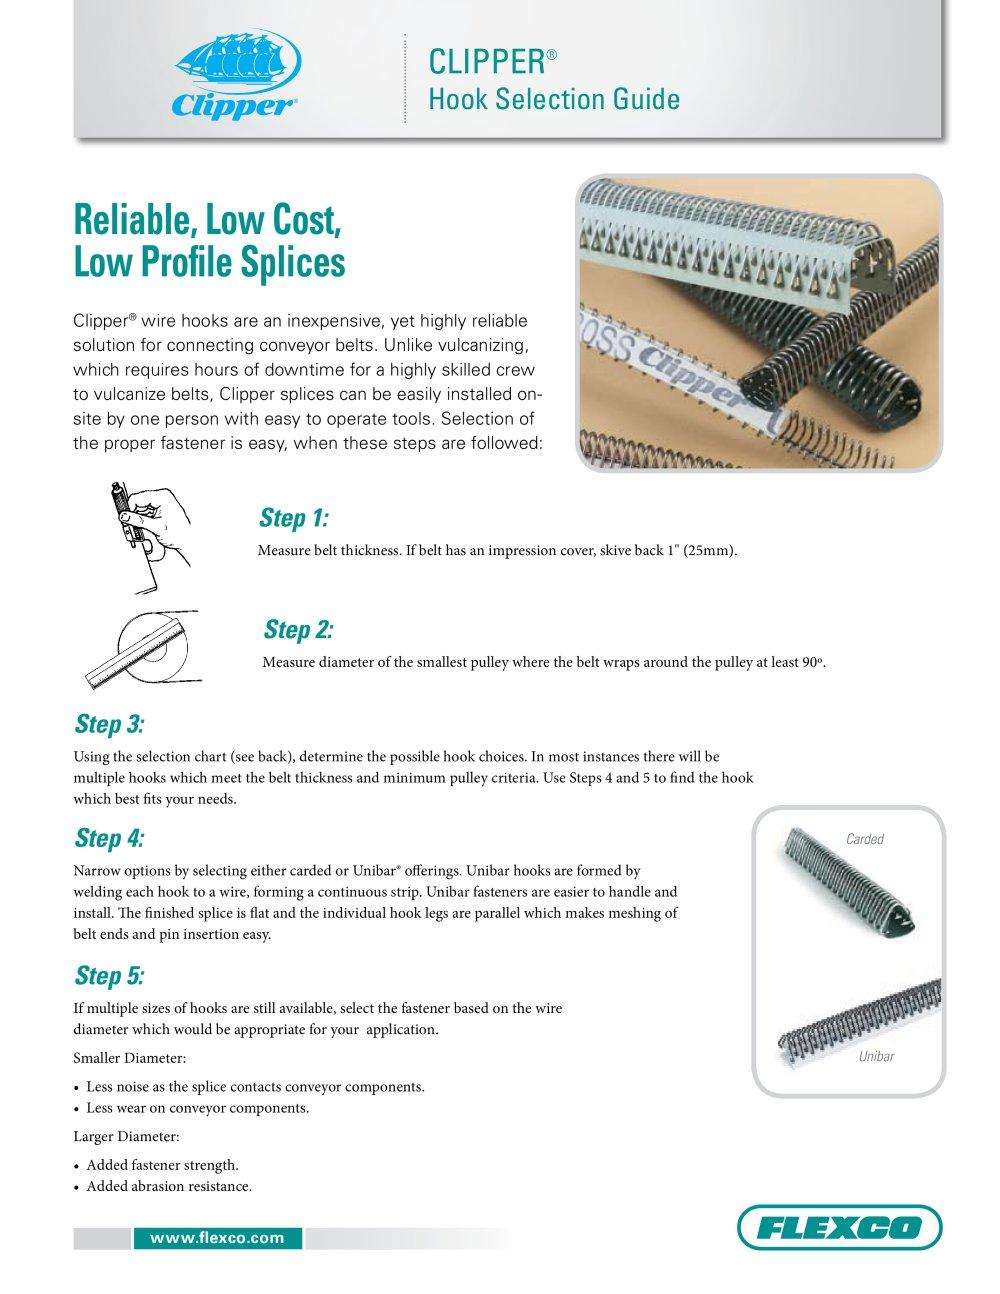 Clipper® Hook Selection Guide - FLEXCO - PDF Catalogue   Technical ...